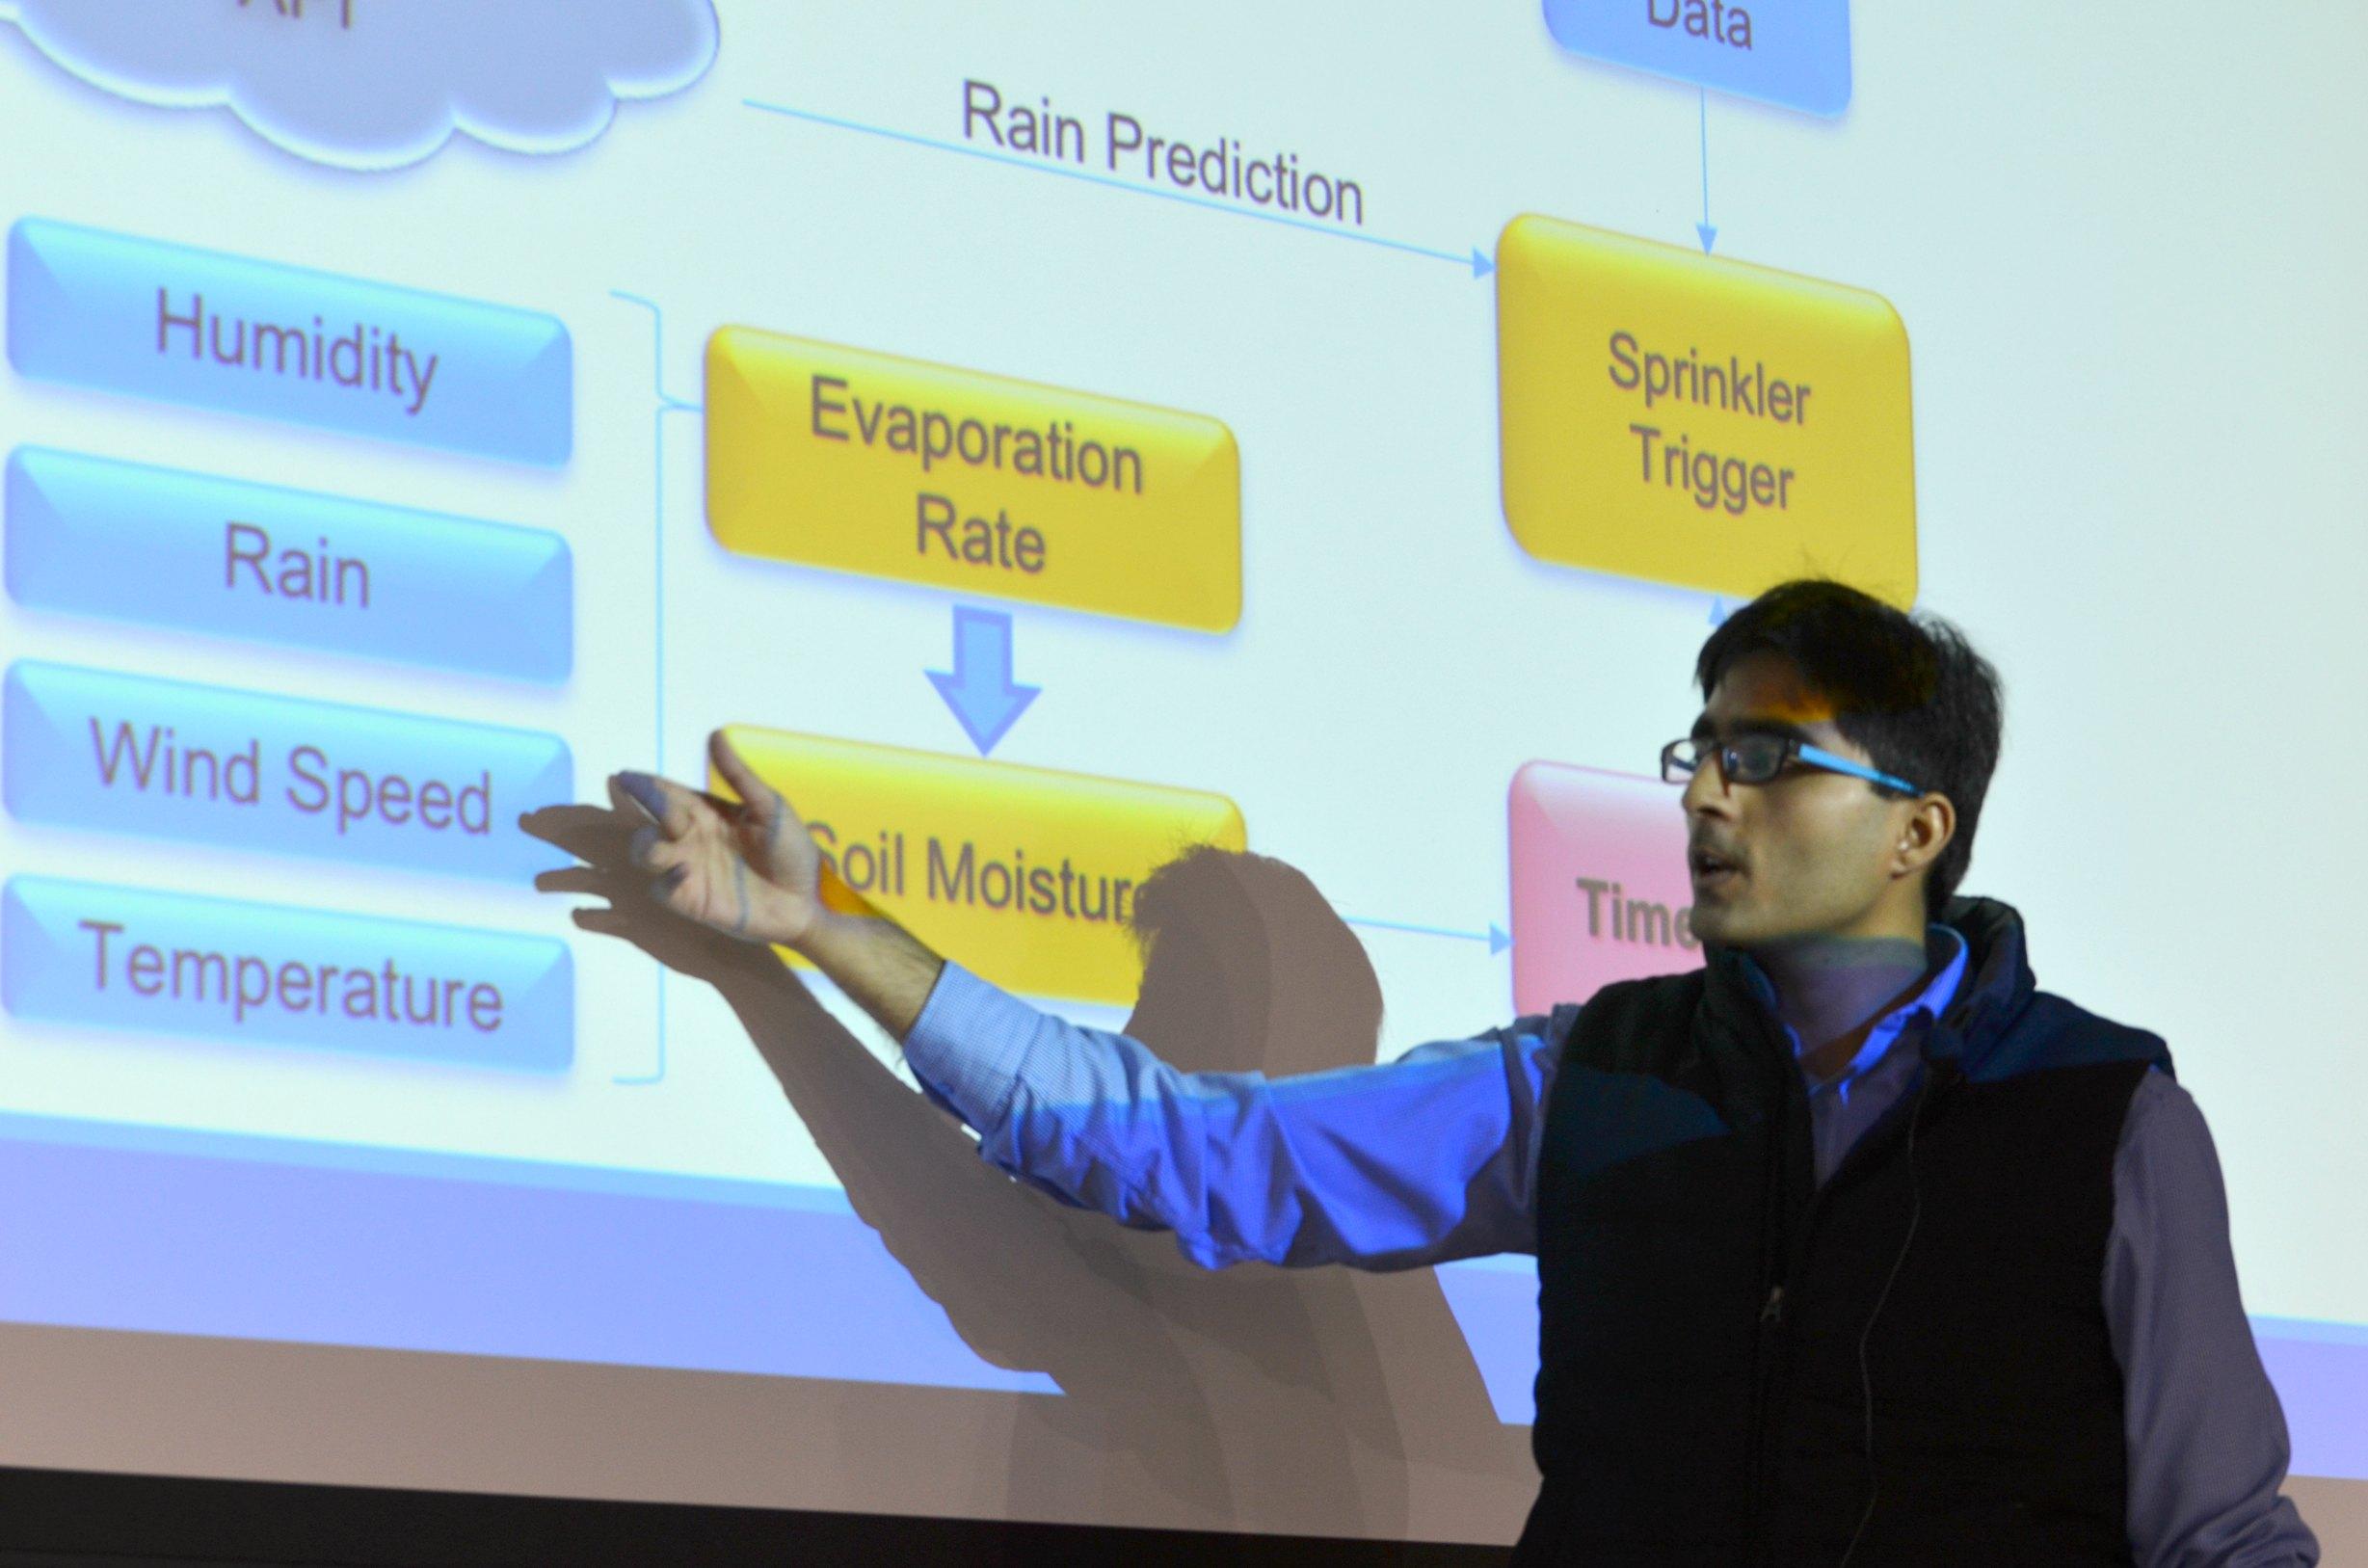 Abhilash-Shrivastava-ge-predix-attacks-water-problems